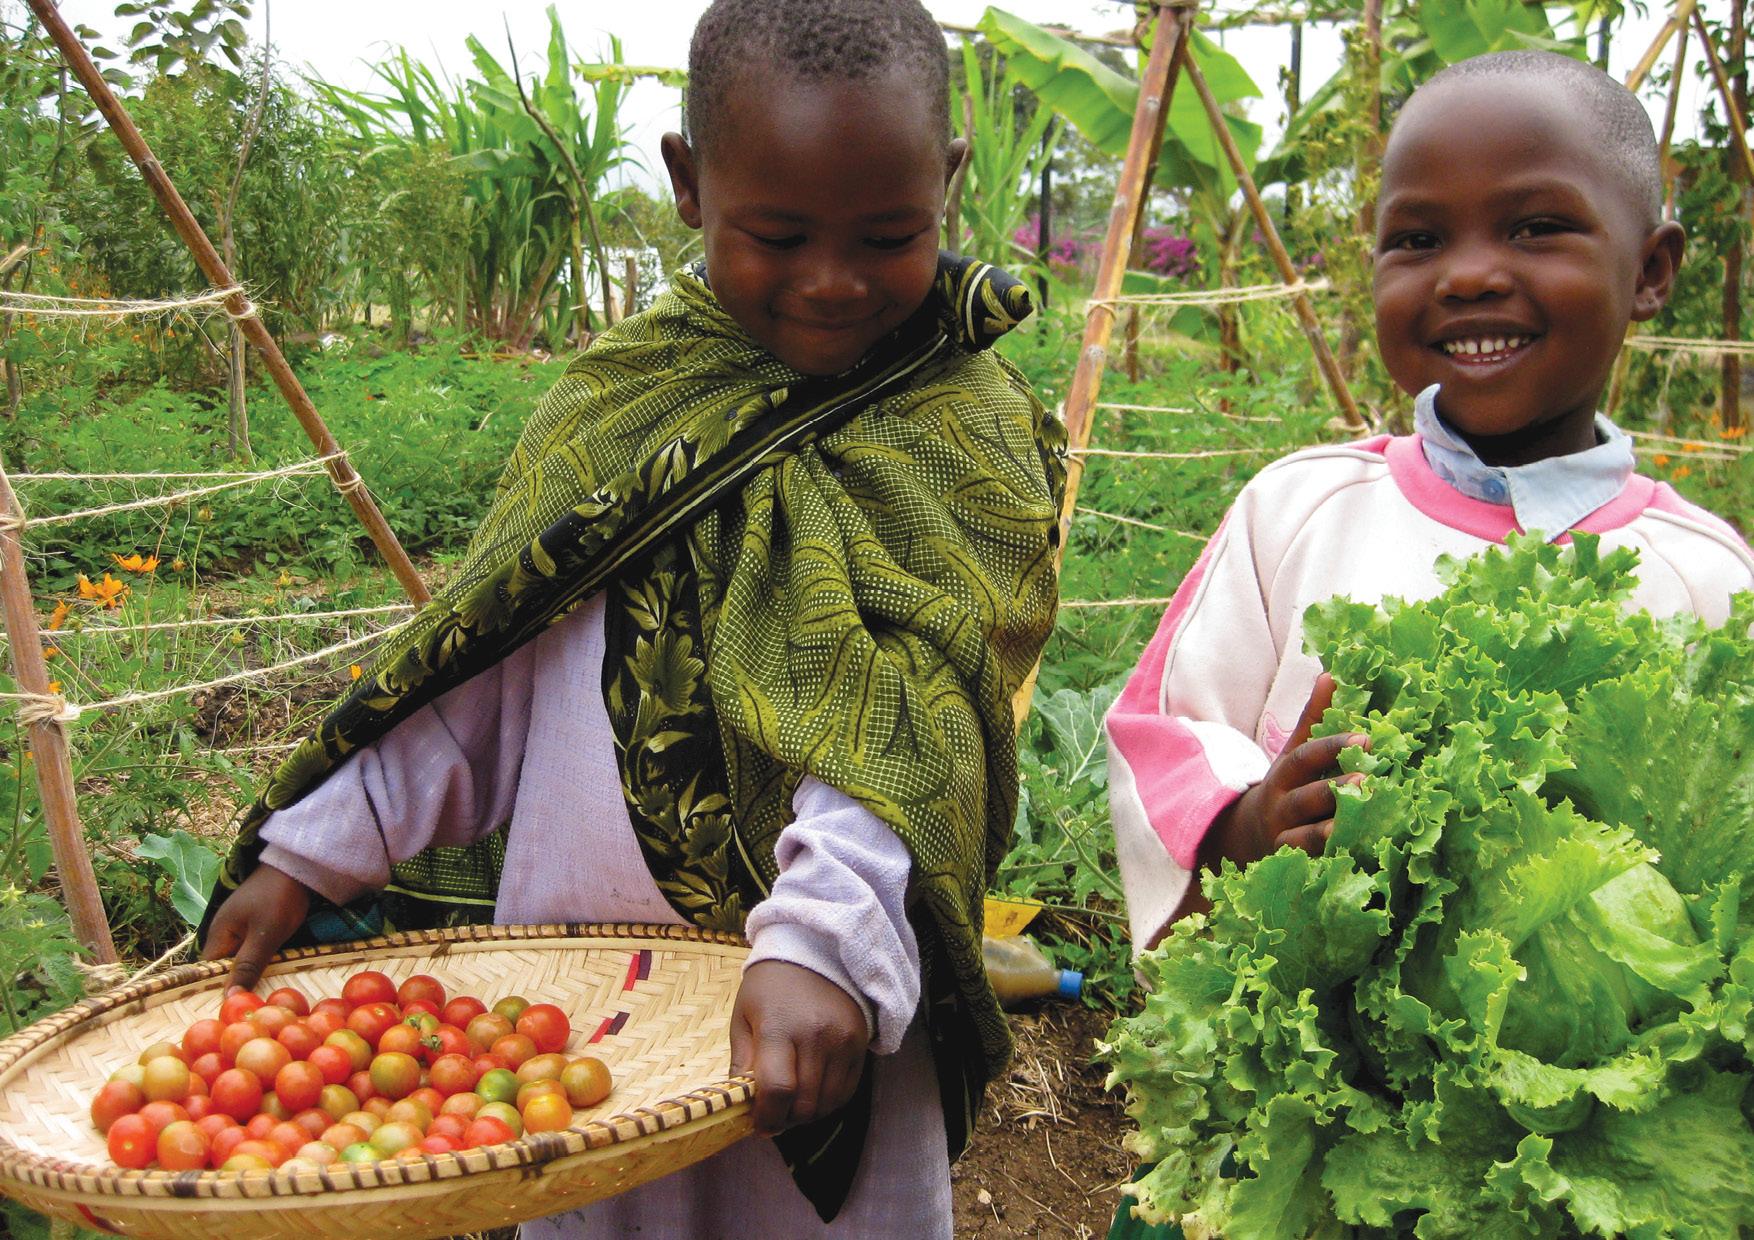 Principle 6: Produce no waste - Growing food for life